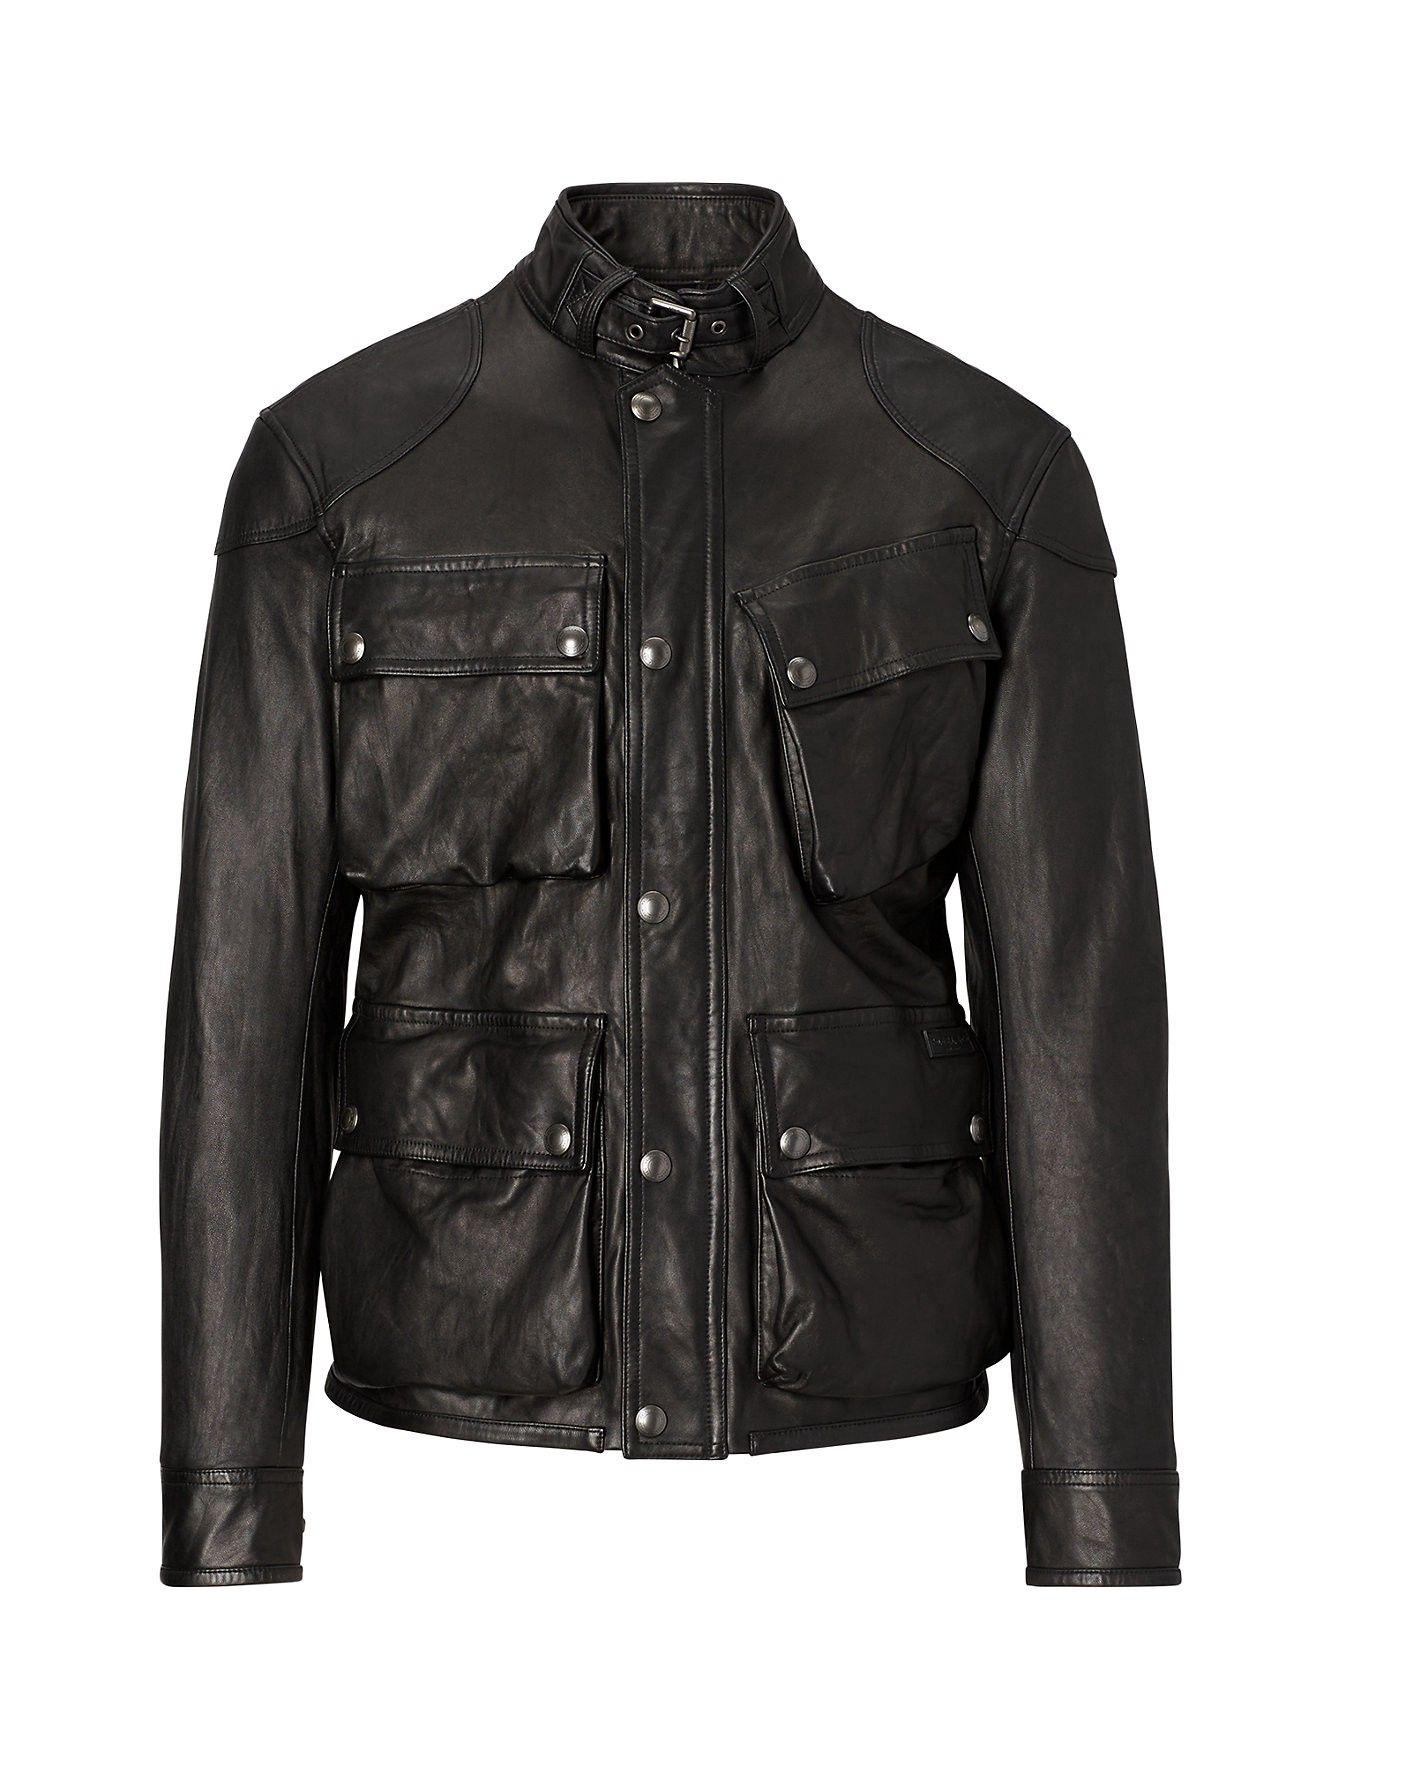 Polo lambskin leather jacket